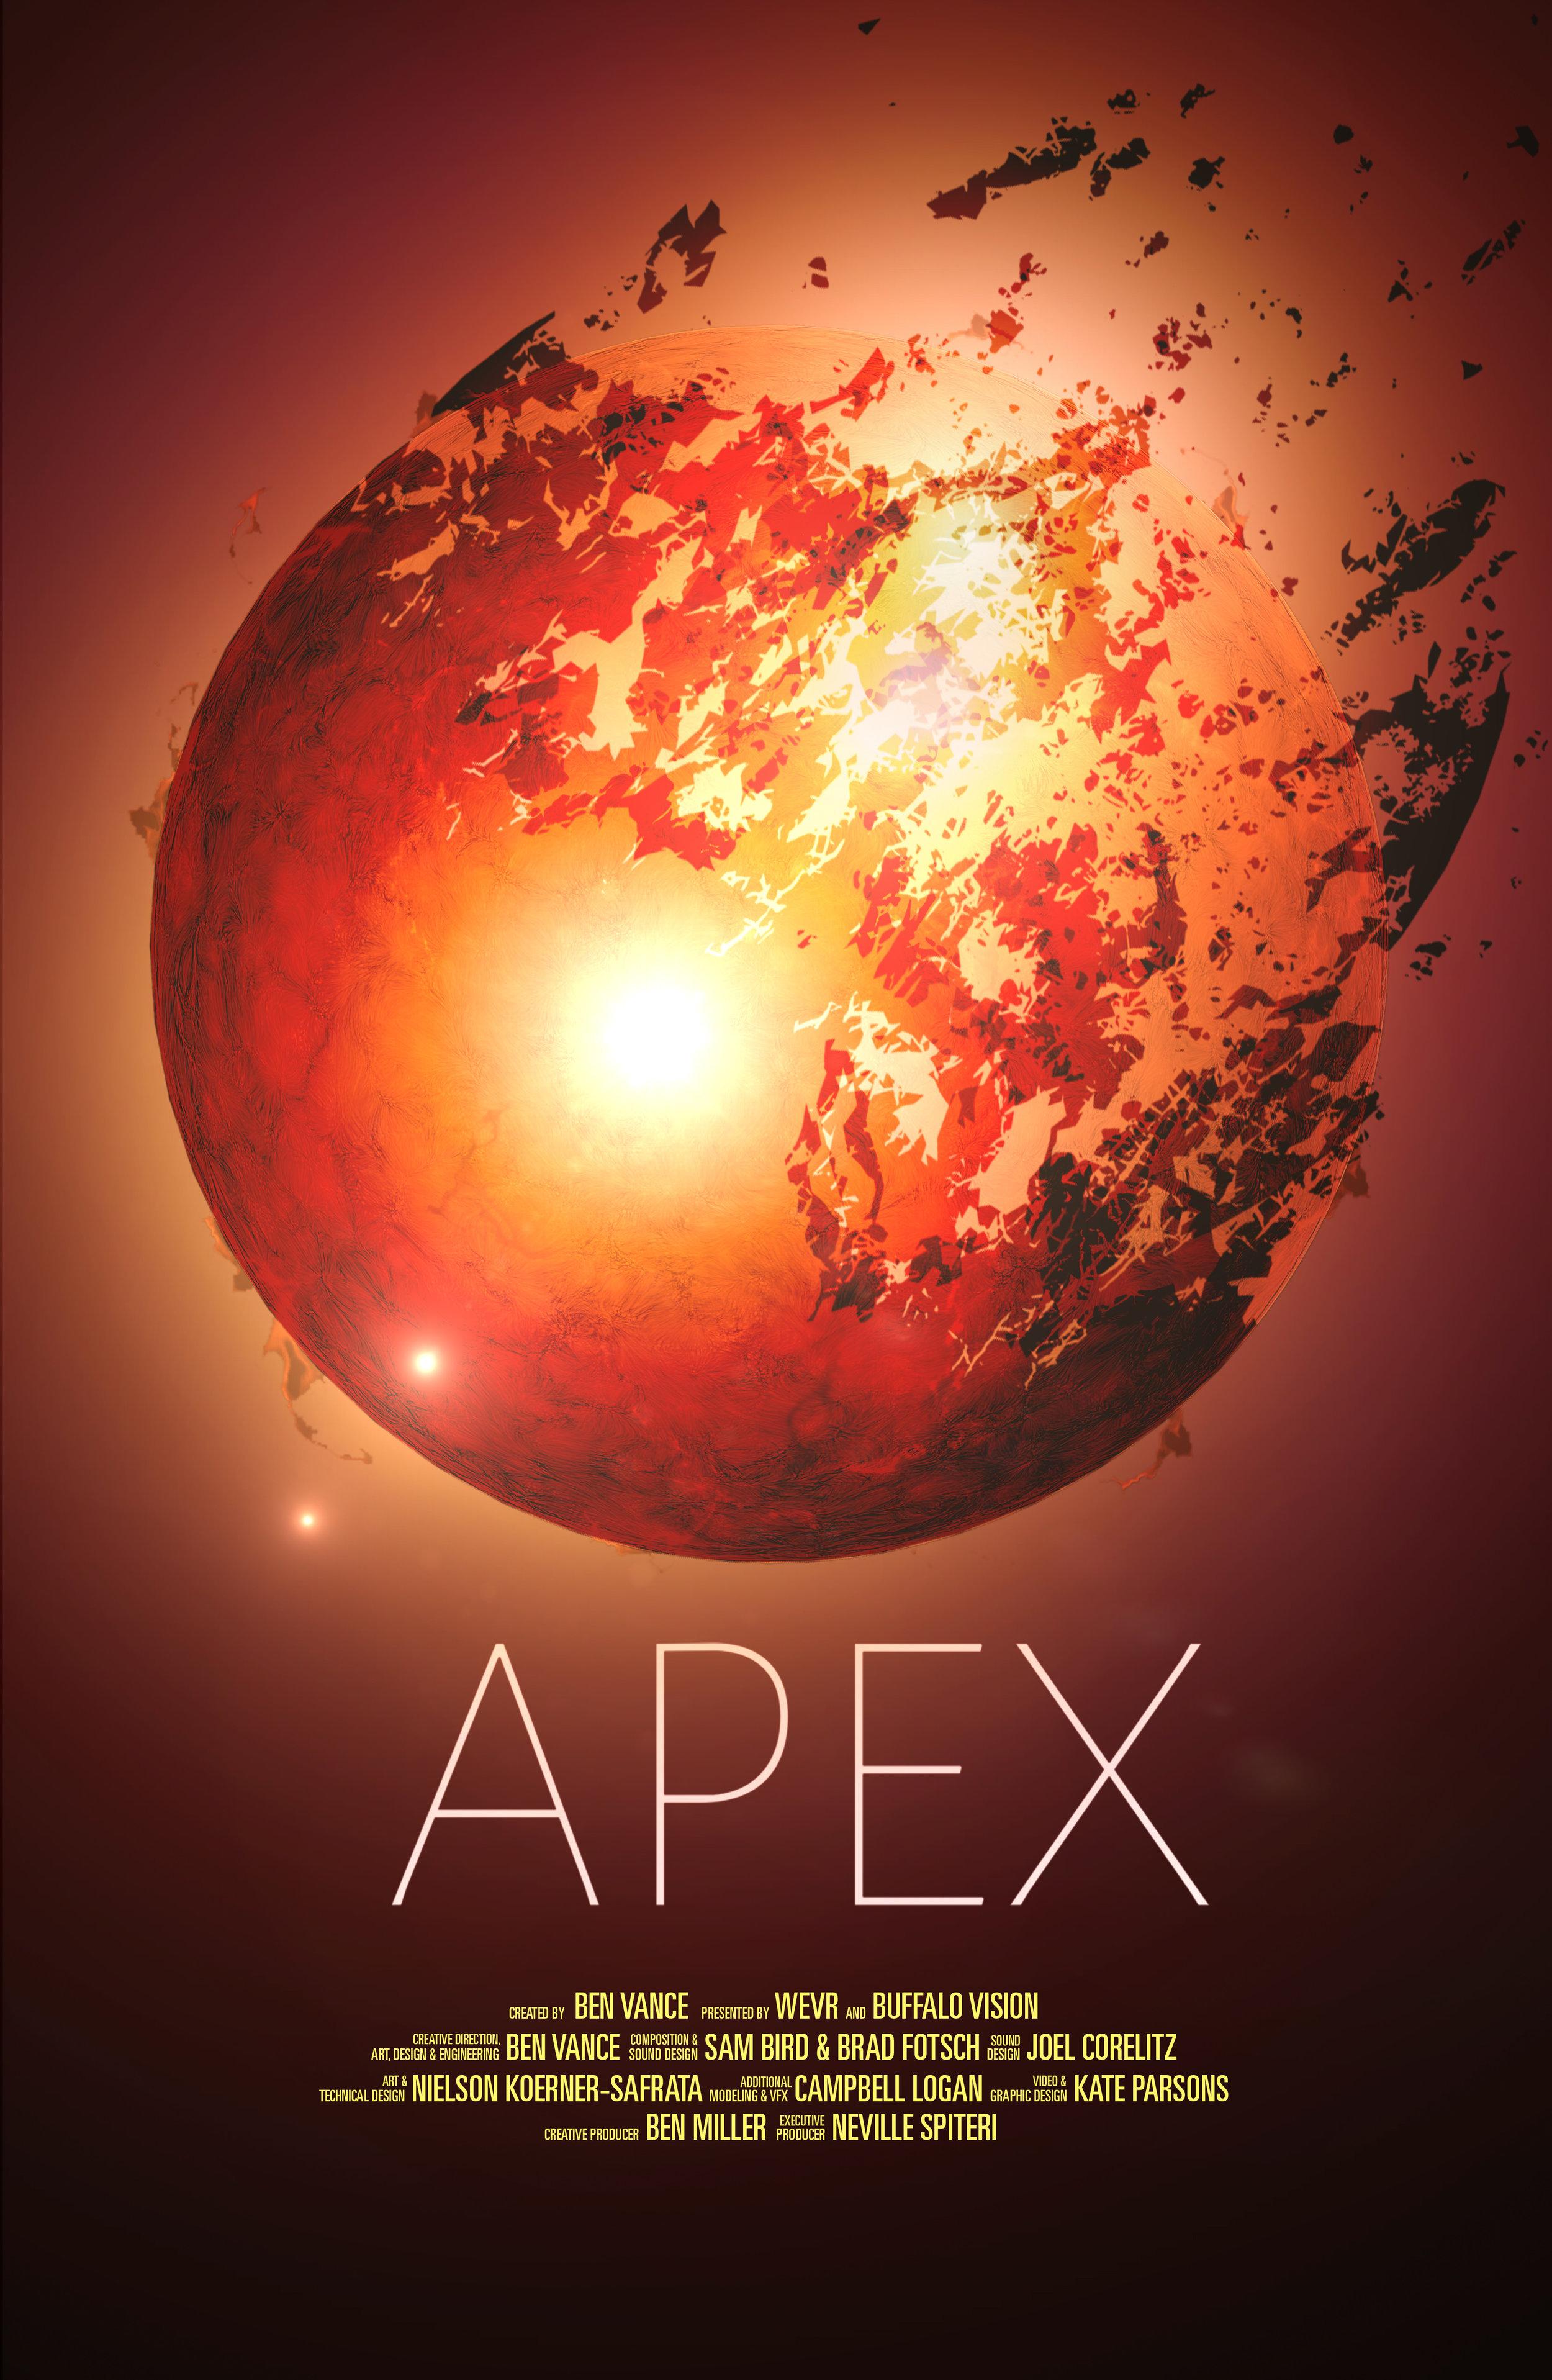 Apex_11.25x17.25poster_04.jpg